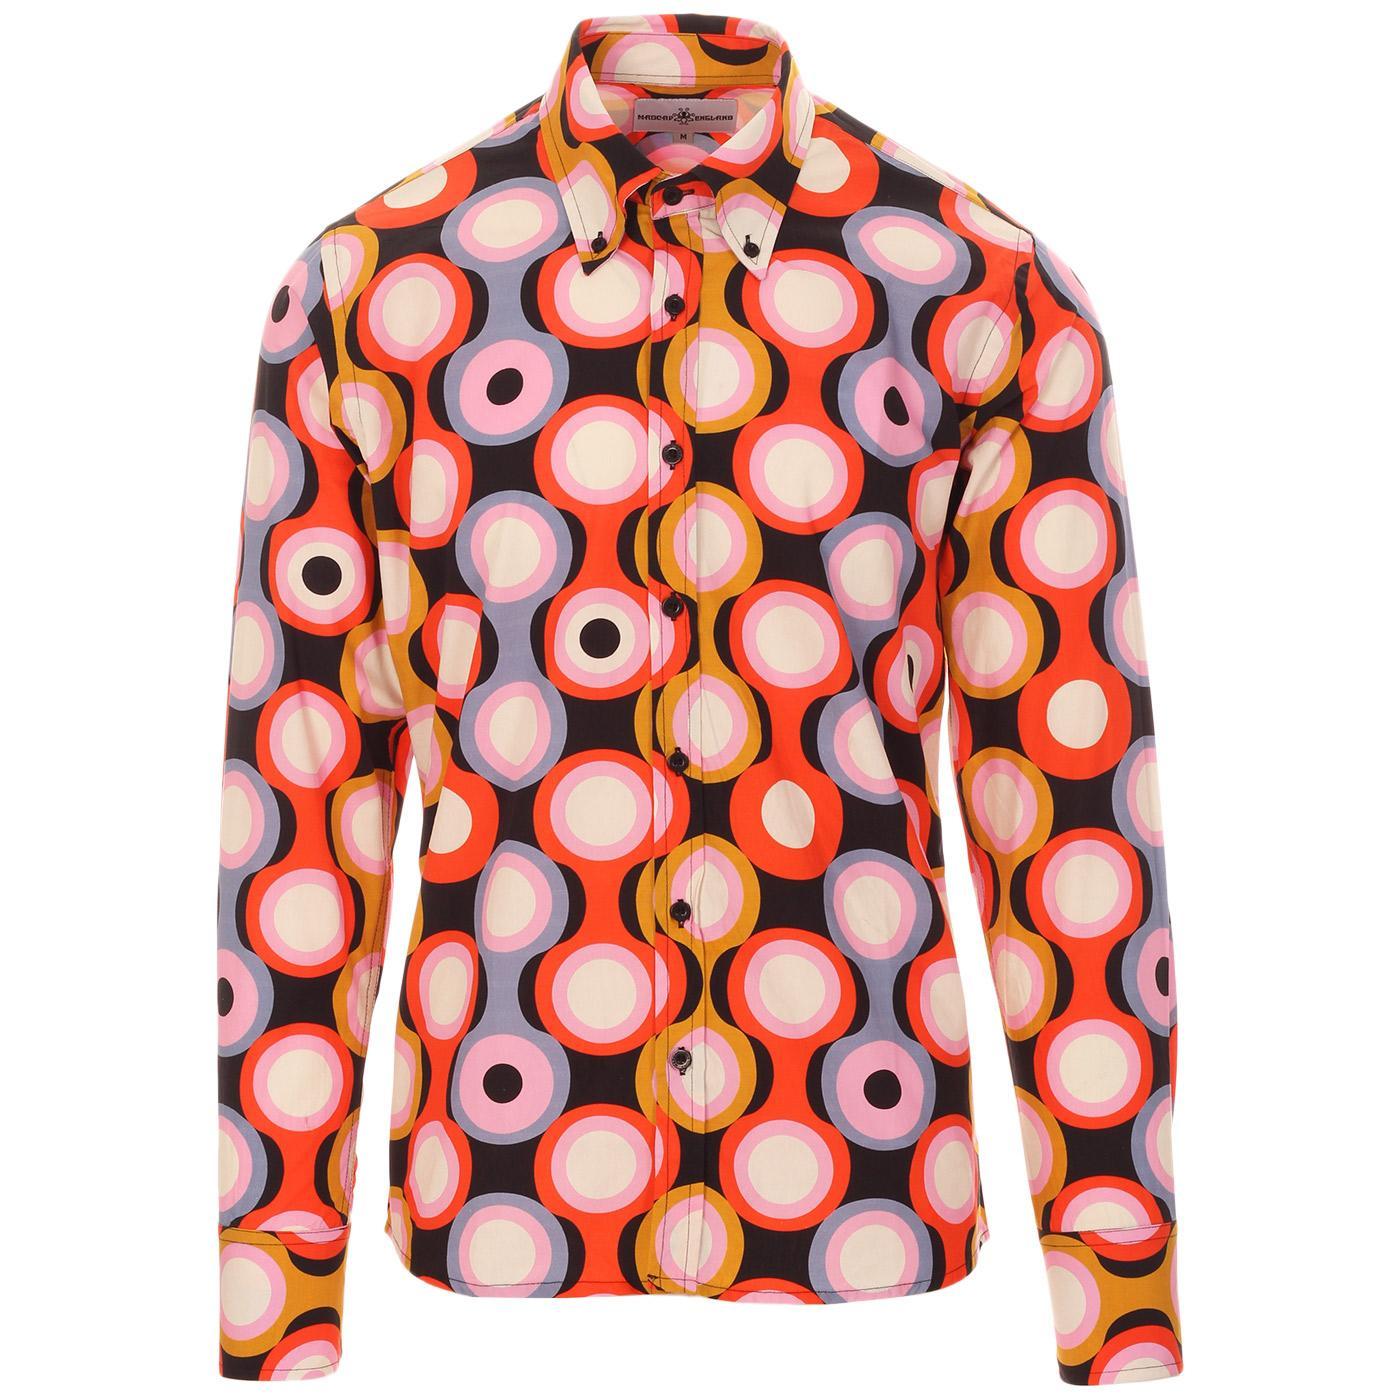 Trip Psych-Out Circle MADCAP ENGLAND Mod Shirt B/P